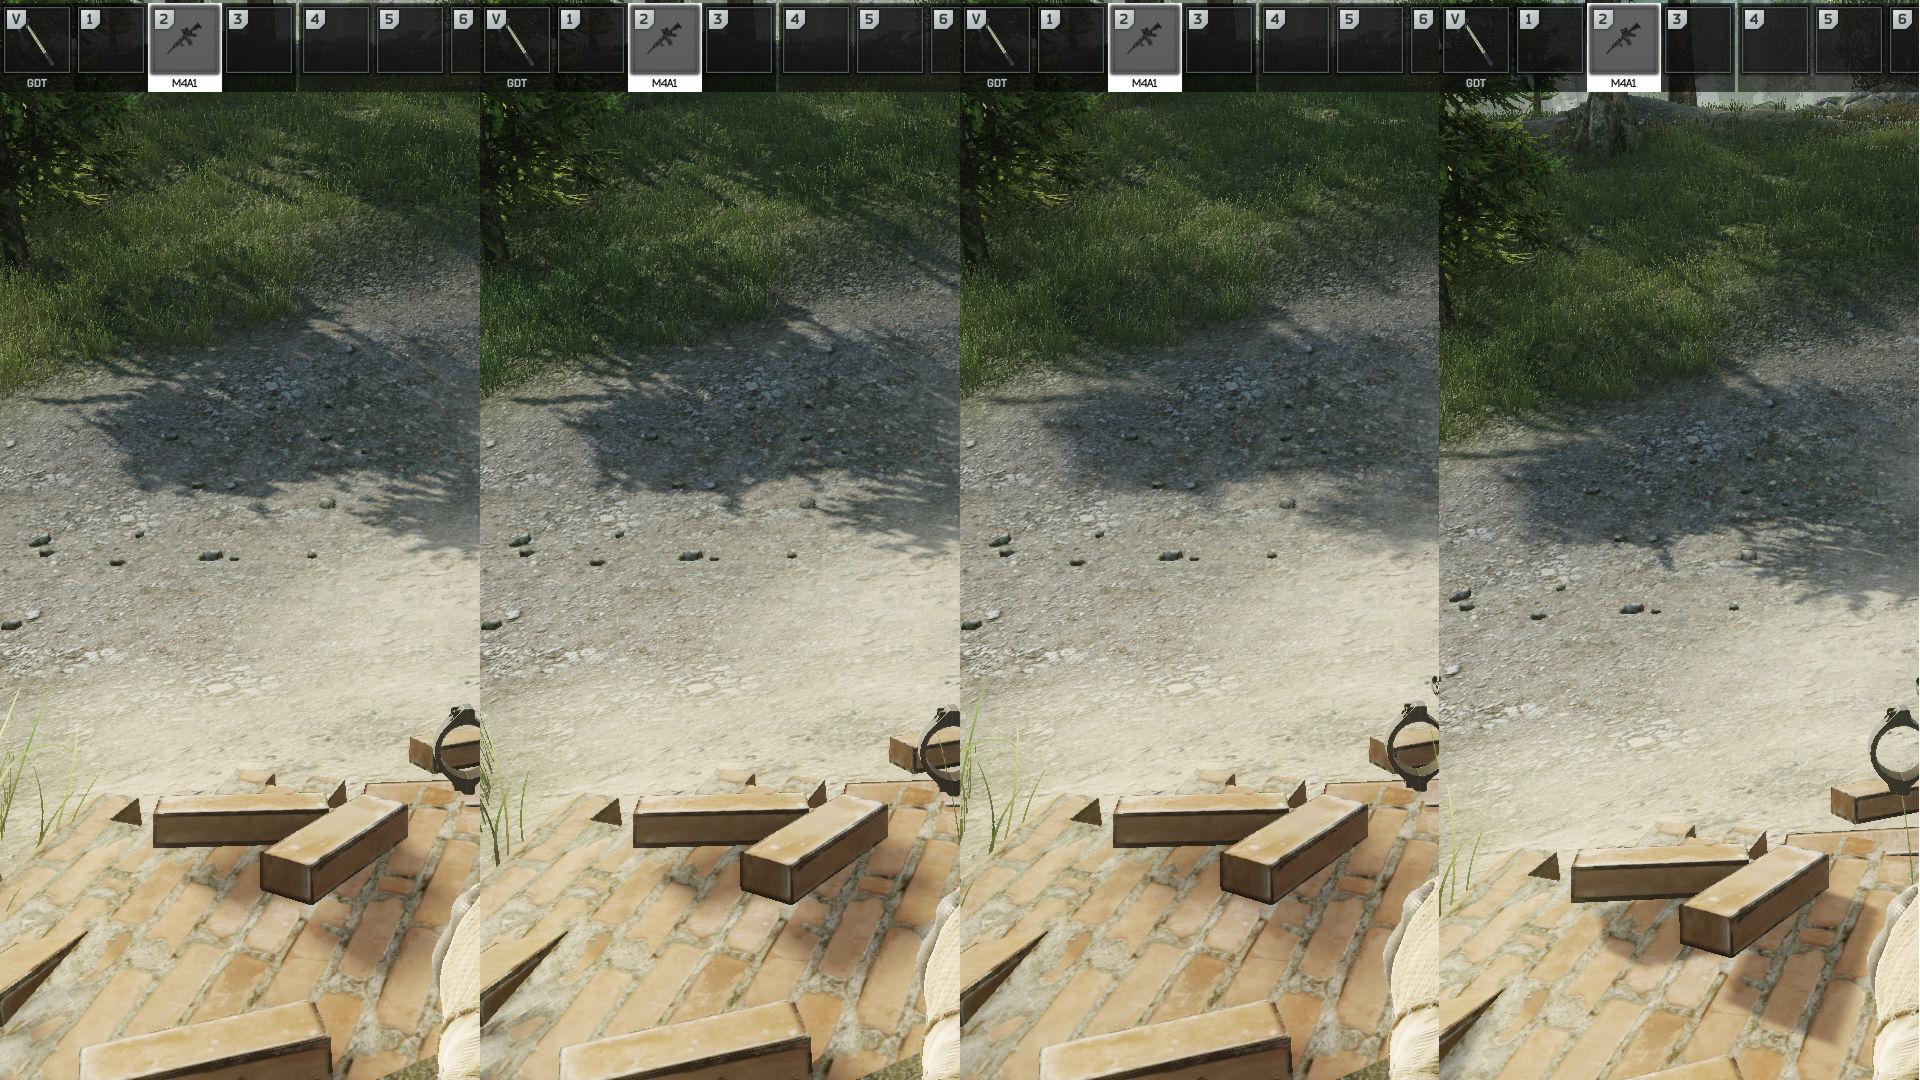 shadow比較.jpg